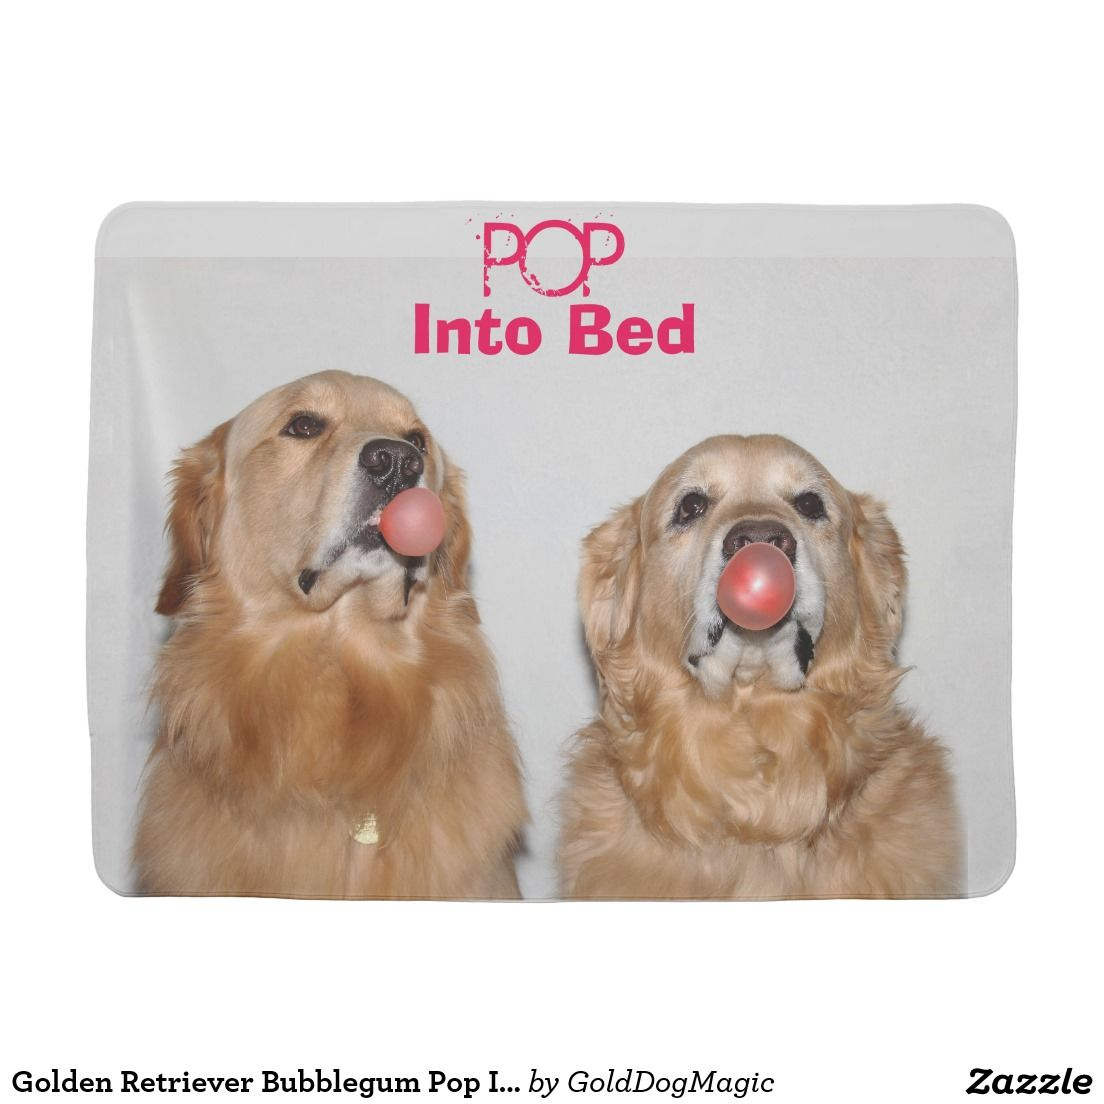 Golden Retriever Bubblegum Pop Into Bed Stroller Blanket